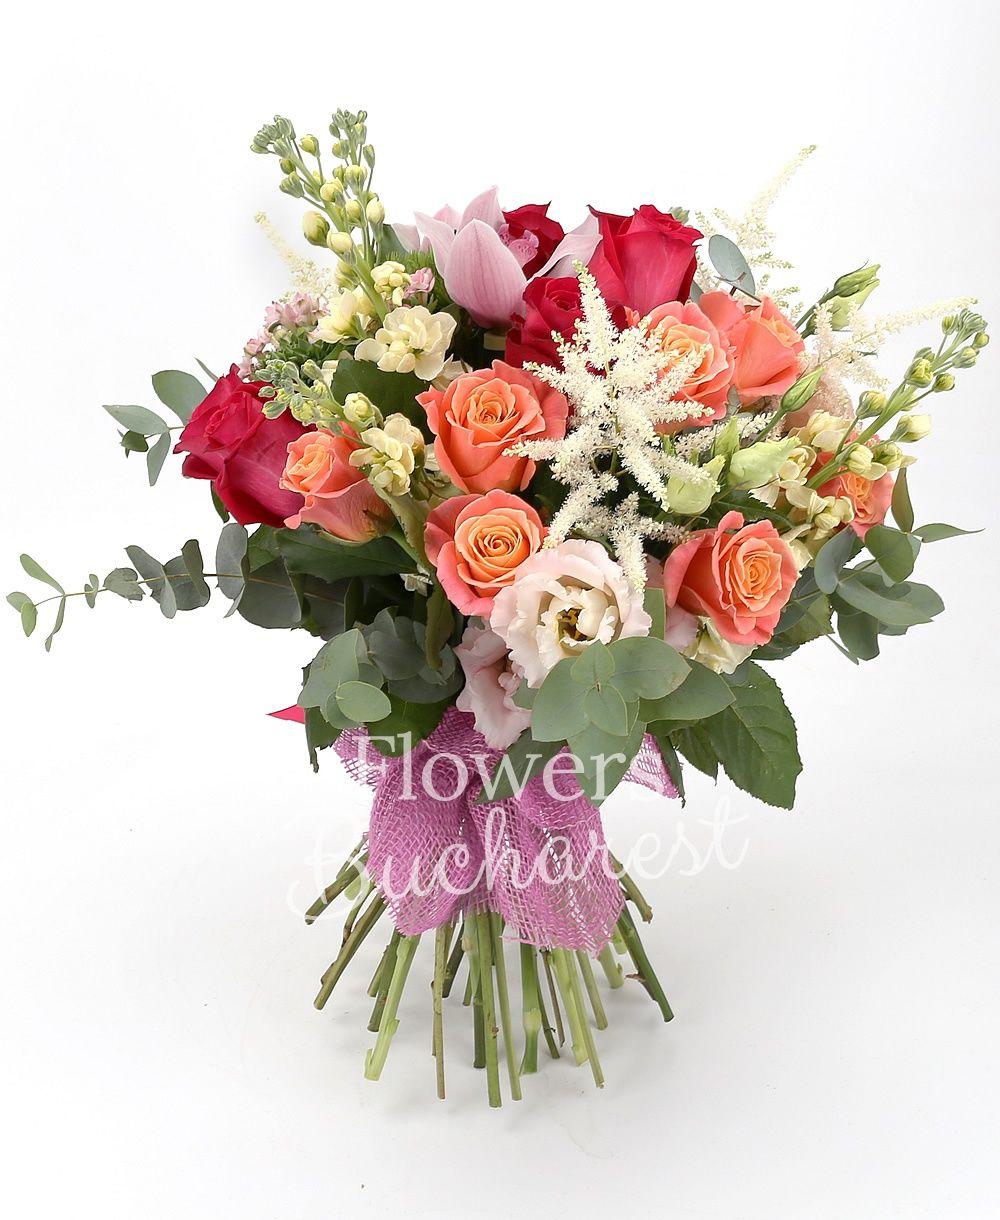 9 miss piggy roses, 5 cyclam roses, 5 pink bouvardia, 5 cream matthiola, 3 pink lisianthus, 5 white astilbe, 5 green carnations, pink cymbidium, greenery